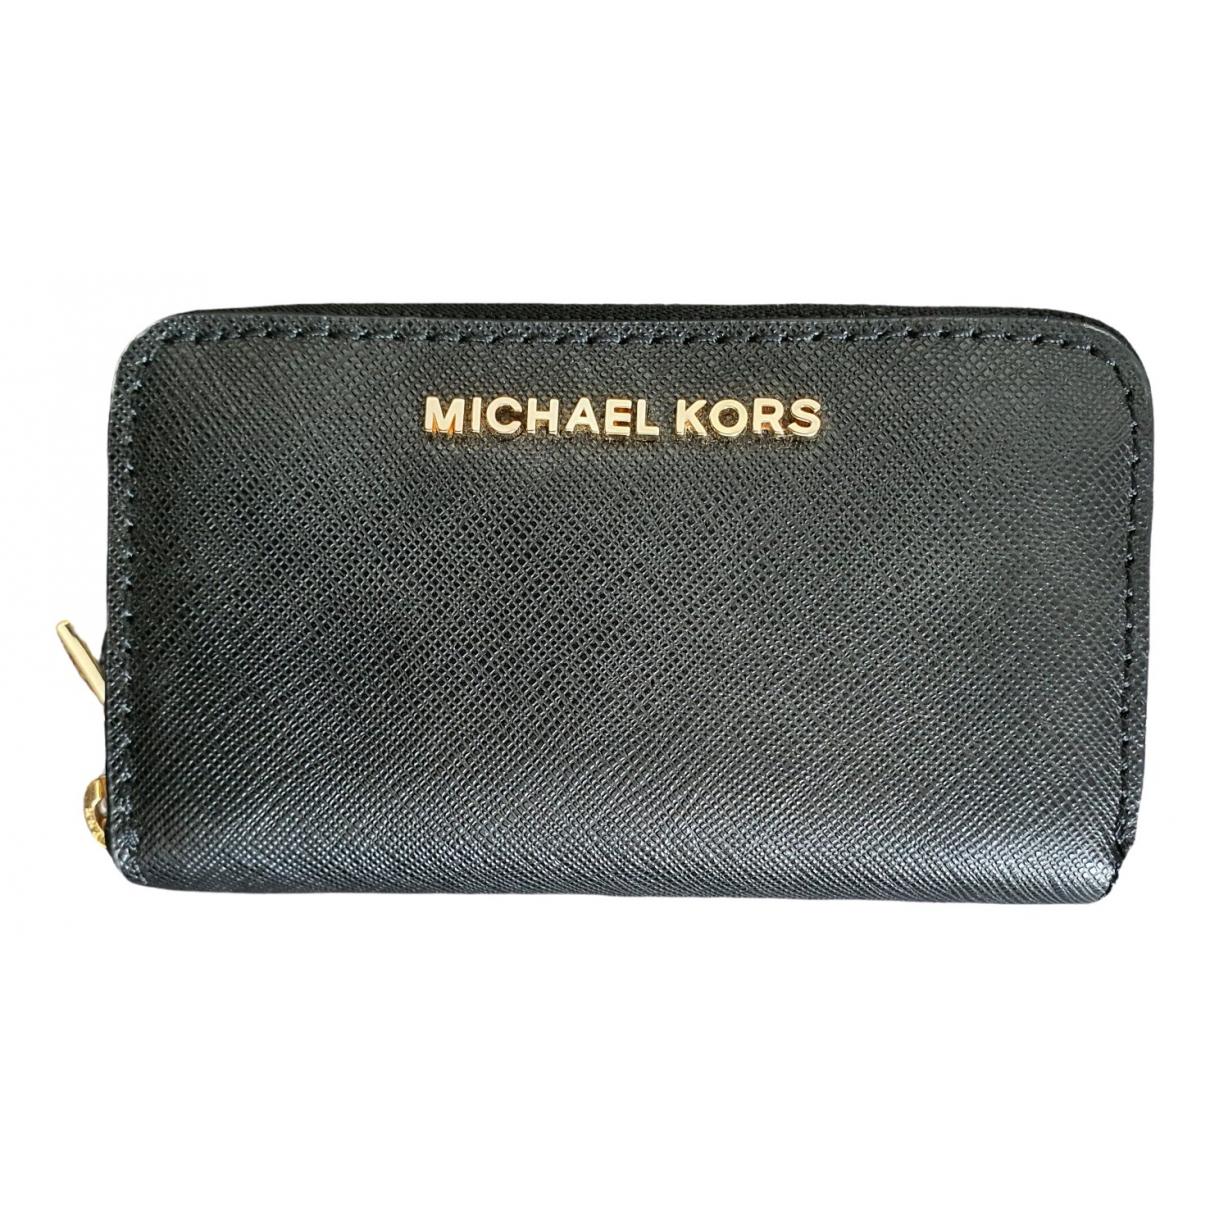 Michael Kors \N Kleinlederwaren in  Schwarz Leder